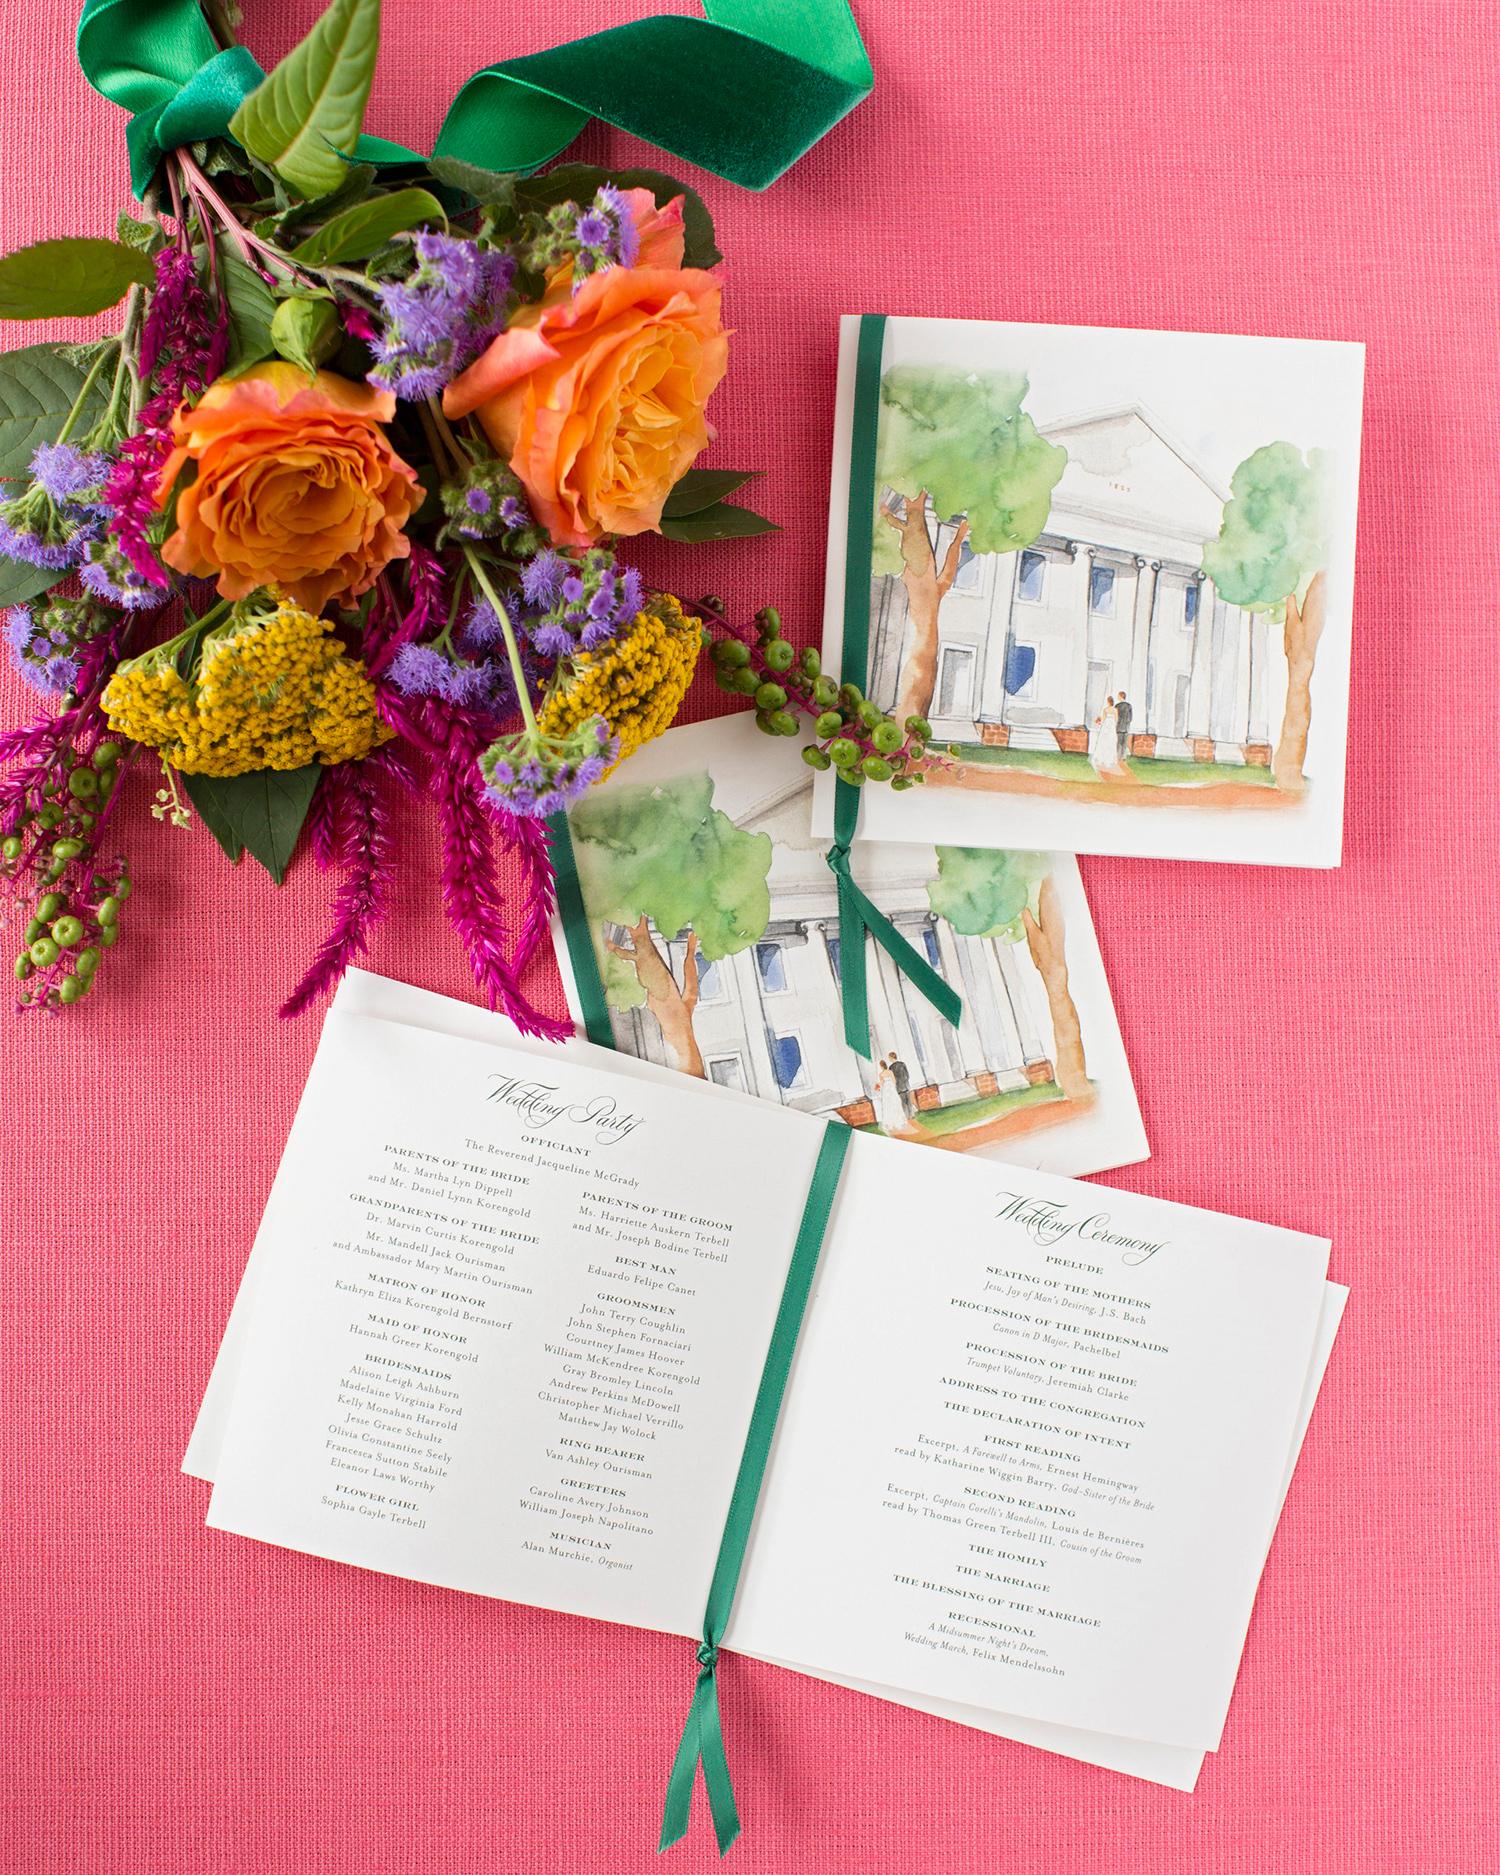 madelyn jon wedding program and flowers